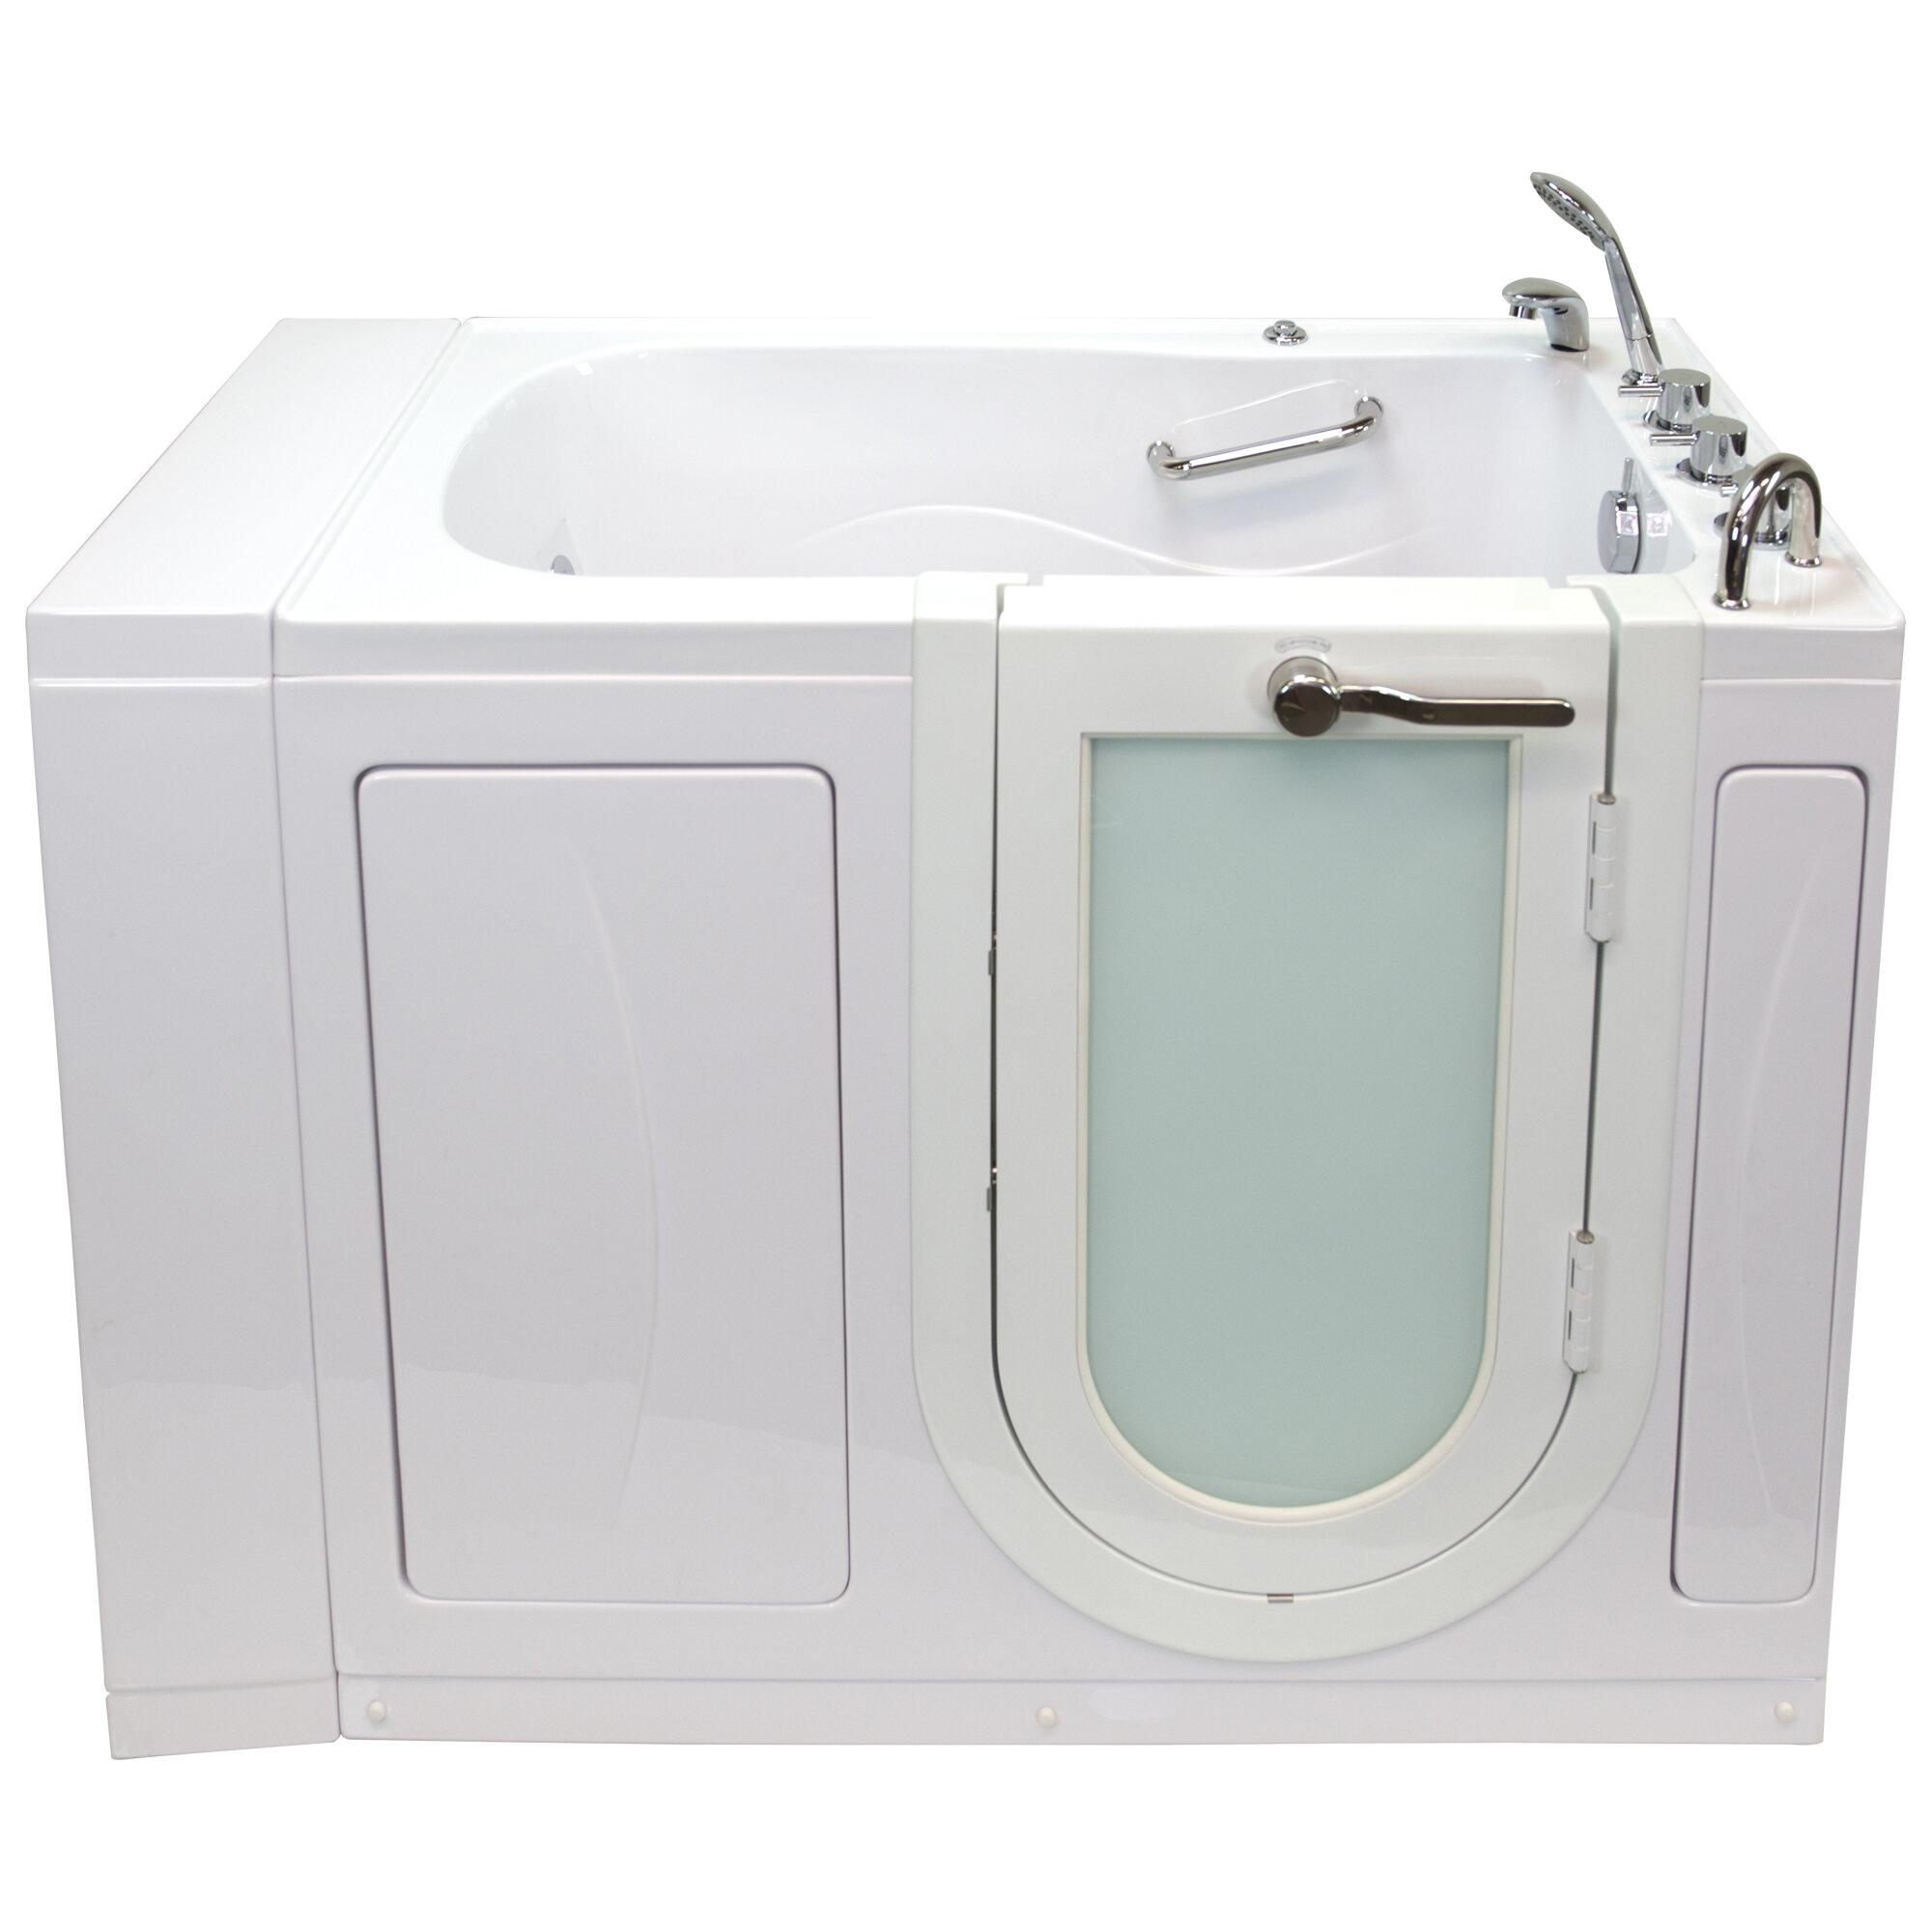 Awesome Whirlpool Bath Shop Composition - Bathtub Ideas - dilata.info